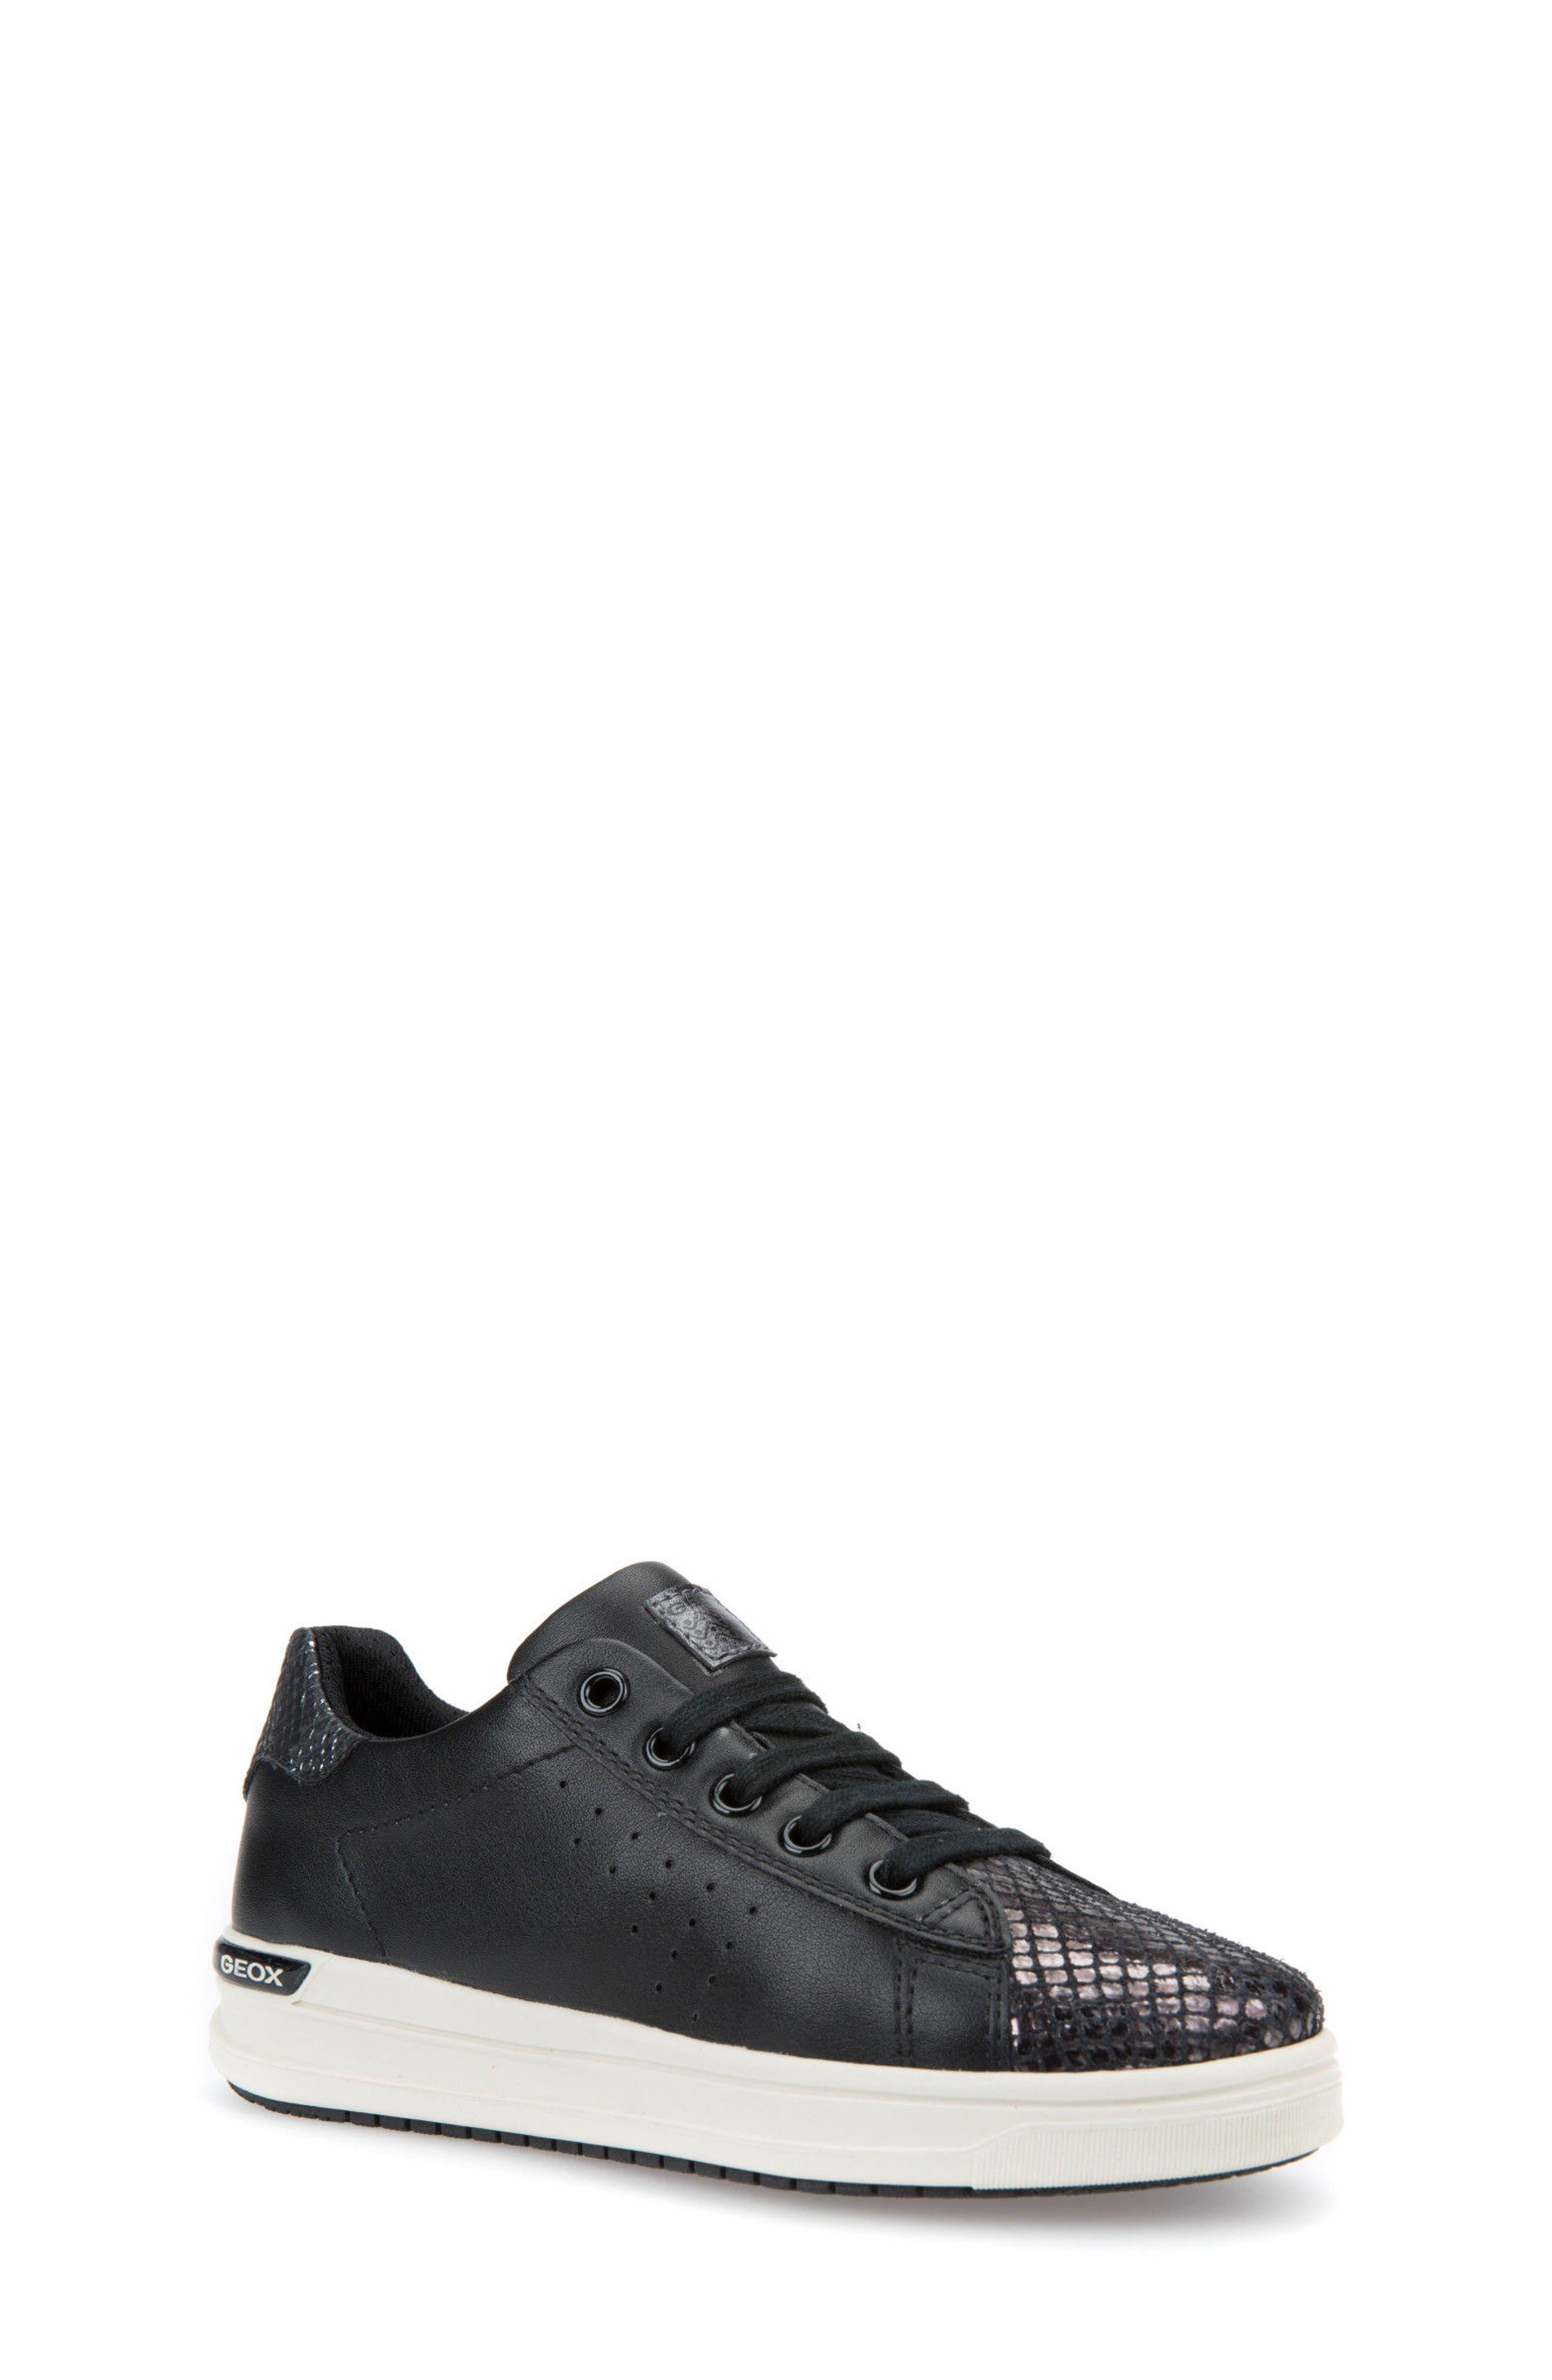 GEOX Cave Up Girl Low Top Sneaker